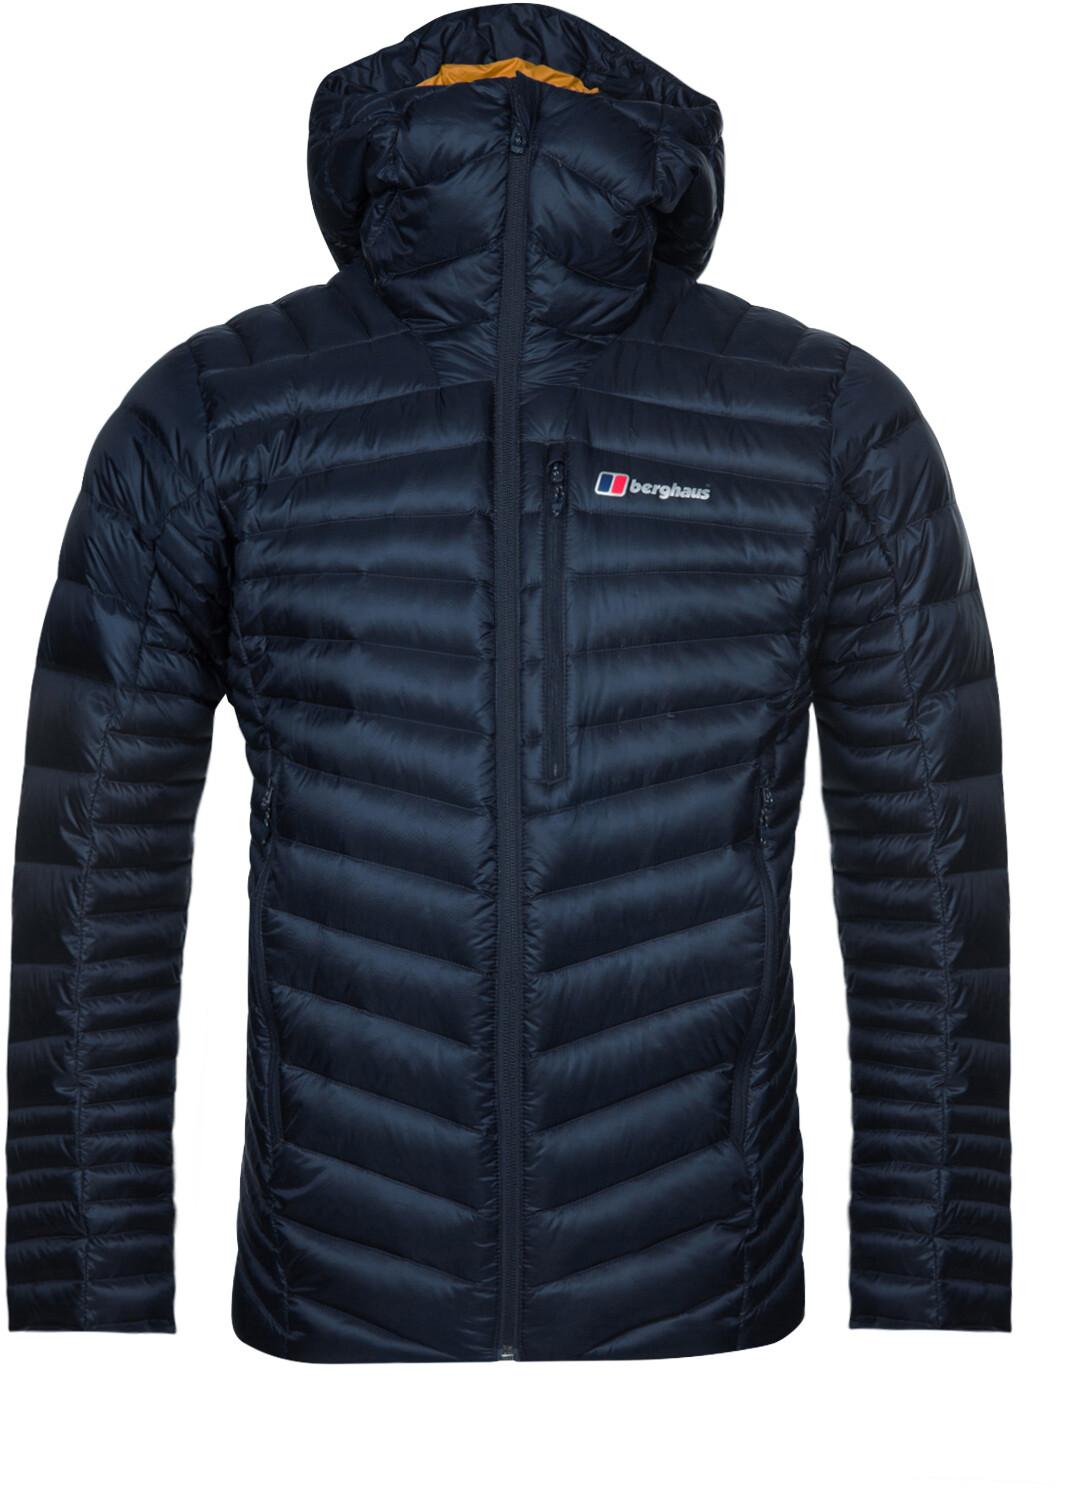 Berghaus Extrem Micro 2.0 Down Jacket Herren dusk